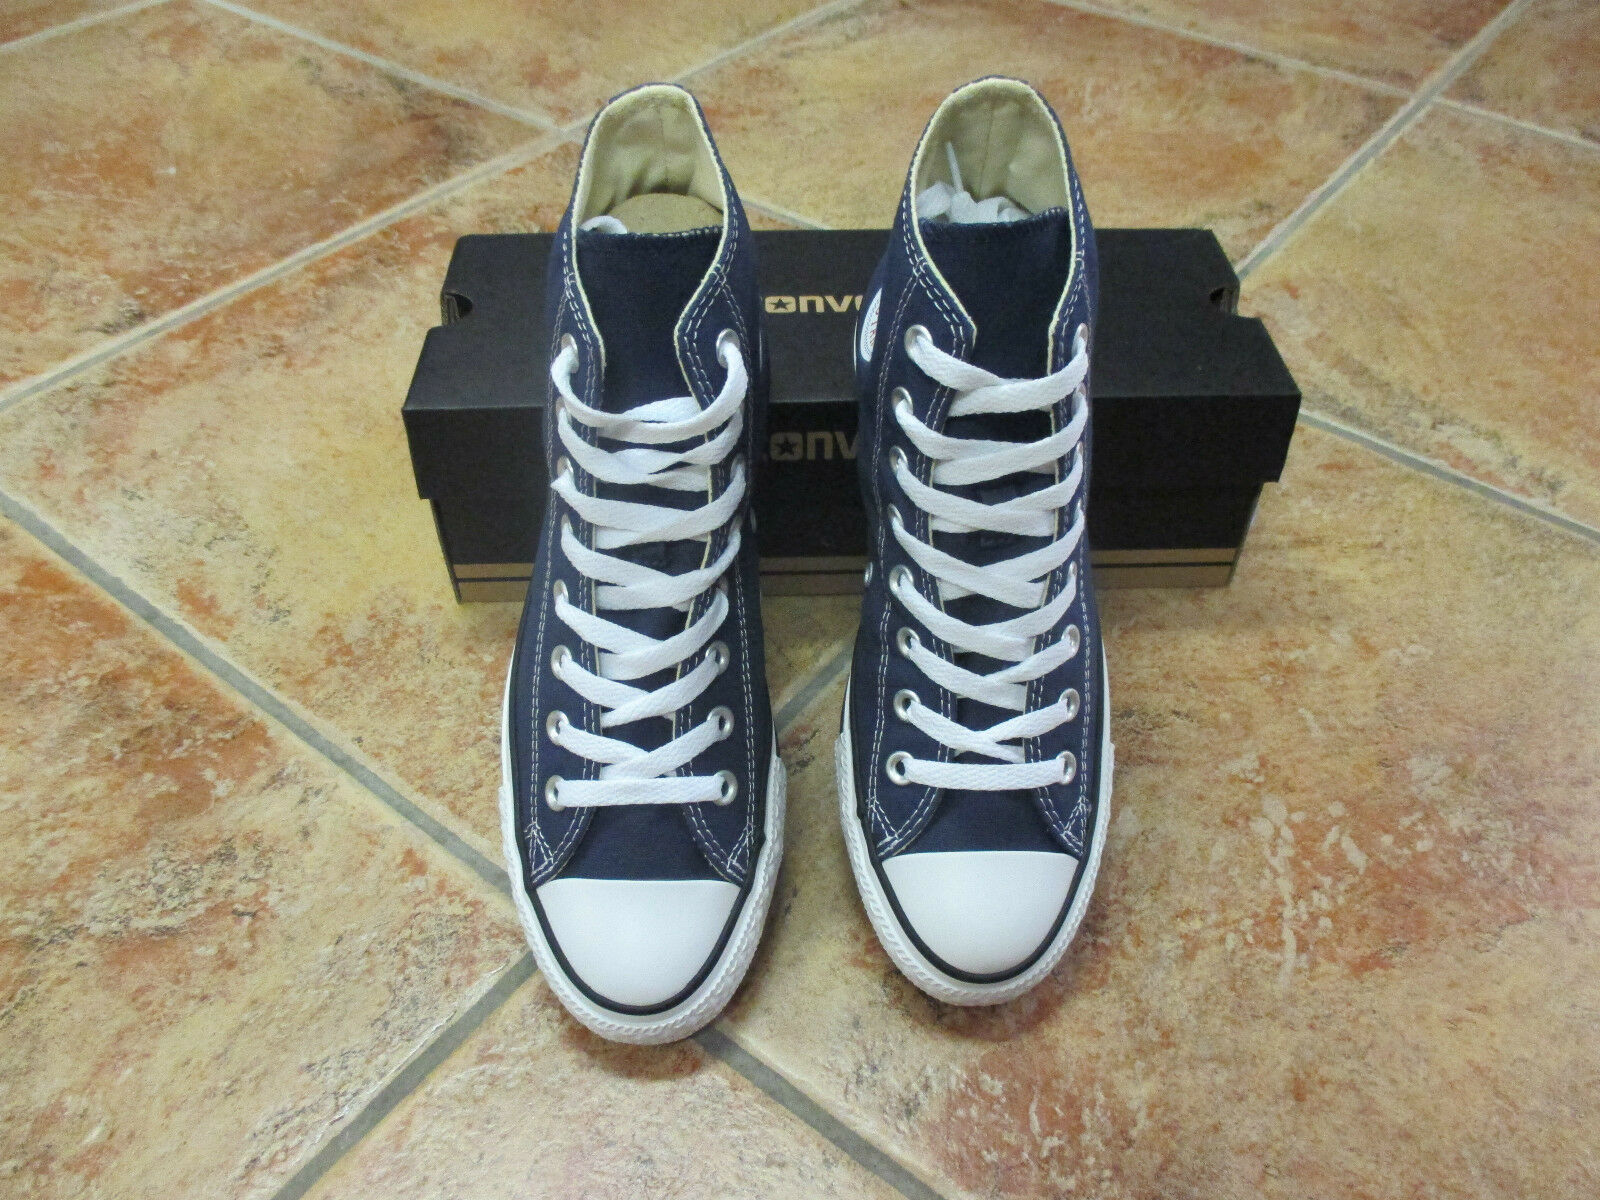 Converse Chucks Bll Star HI Größe 41 blau navy M9622C Neu Sneaker